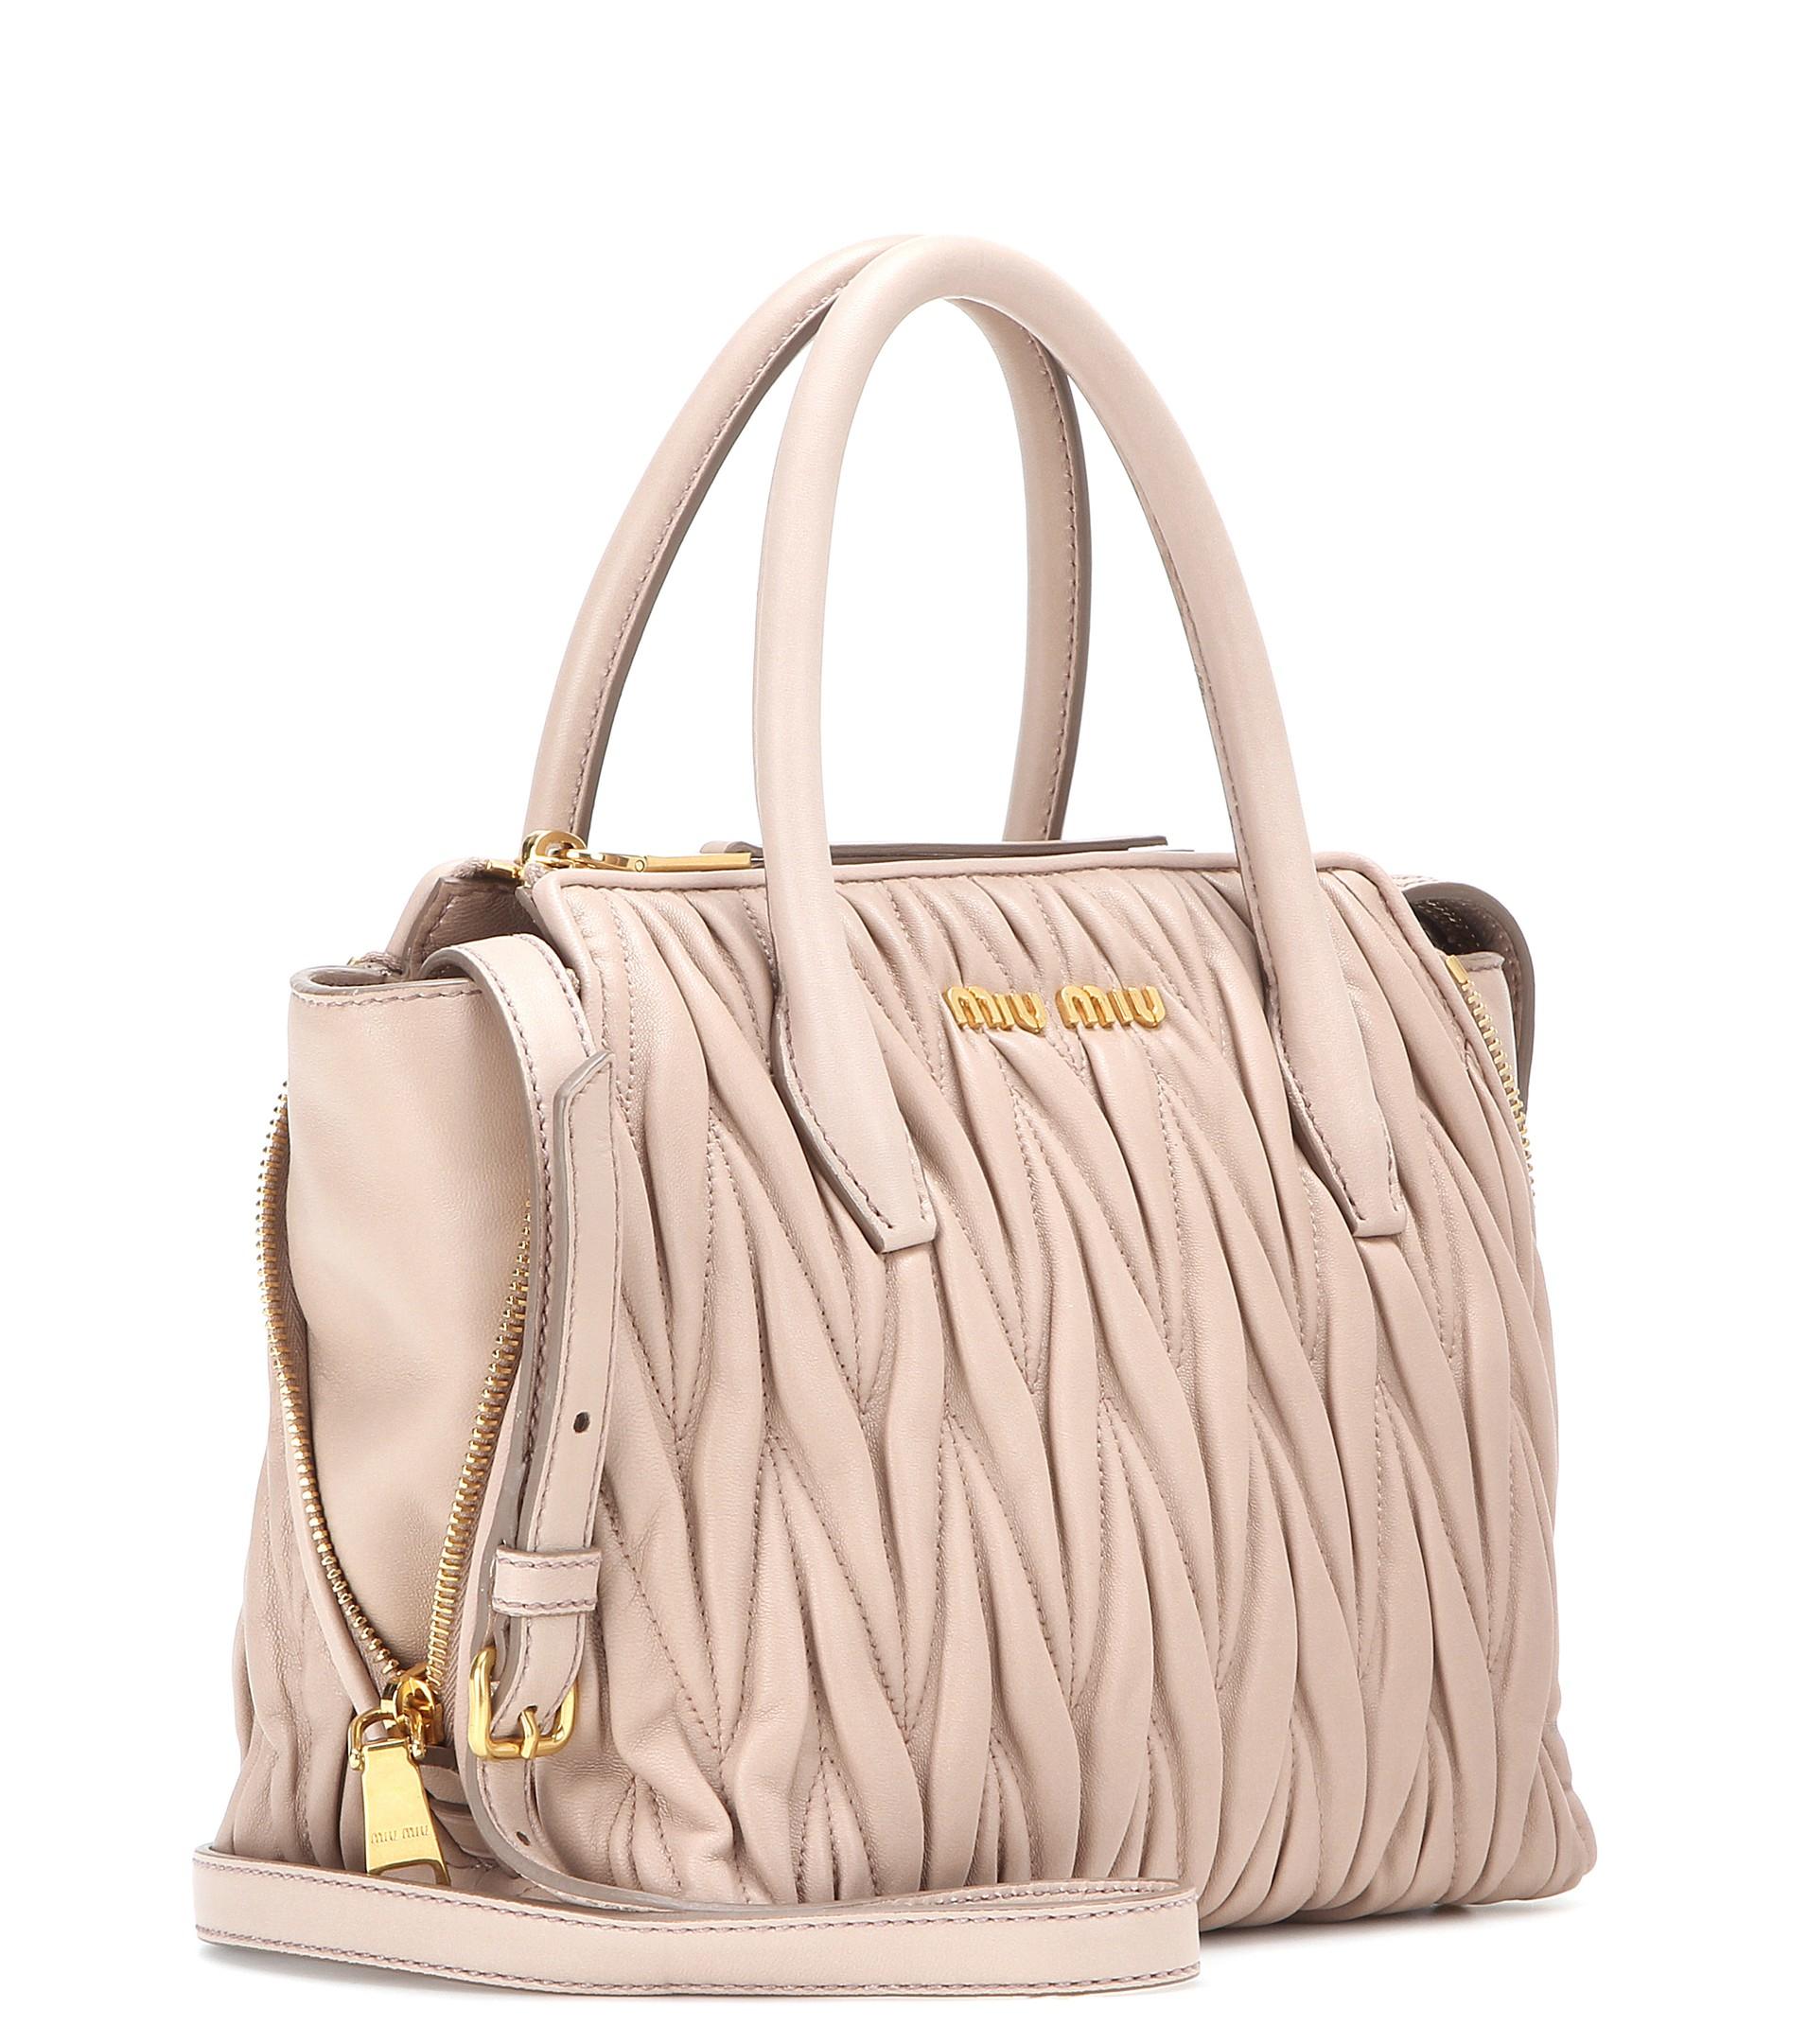 Miu Miu Large Leather Tote Bag